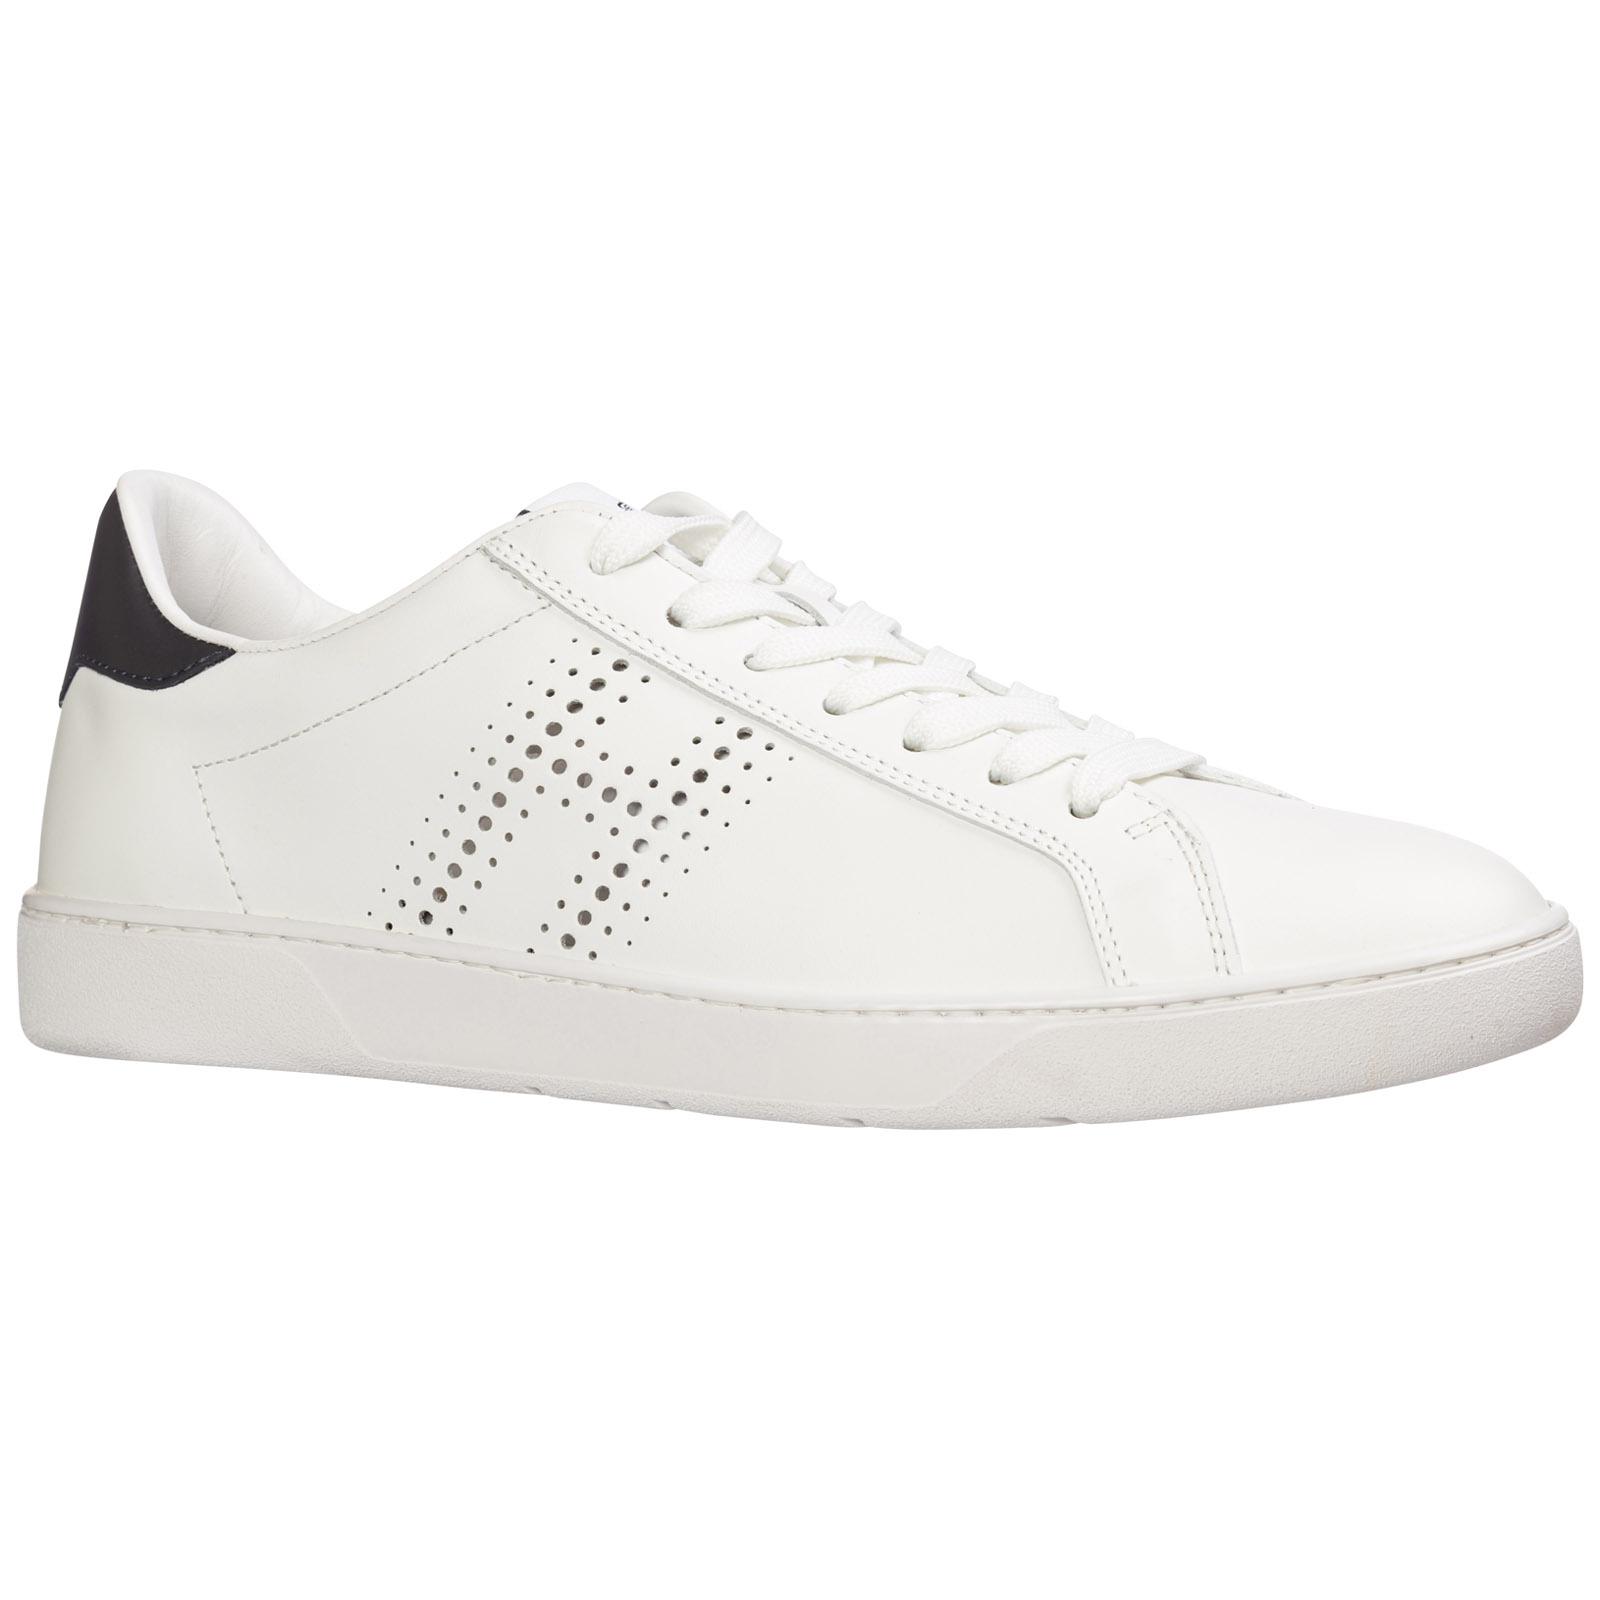 Sneakers Hogan h327 hxm3270bt10jbf1353